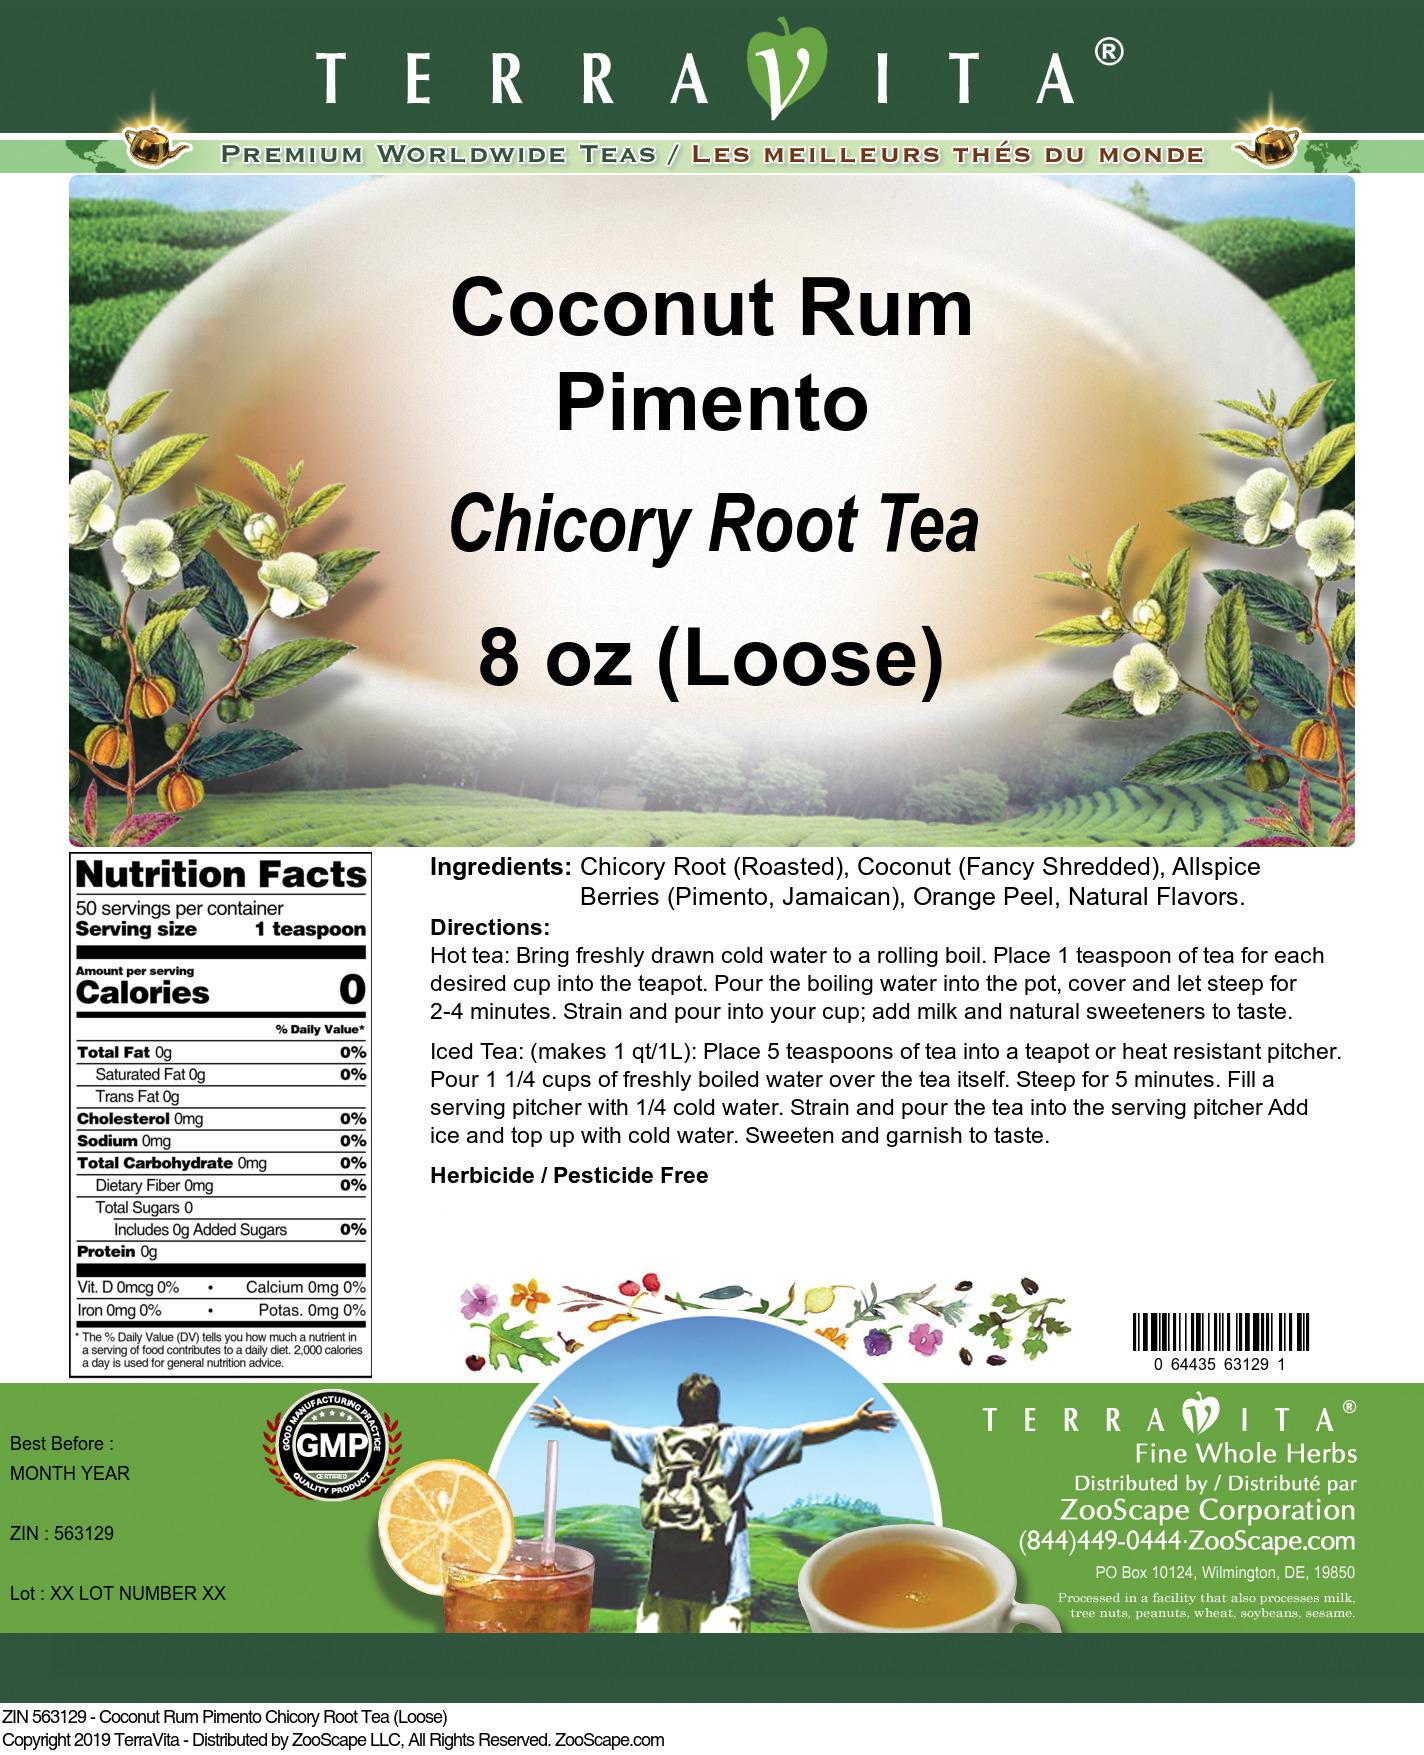 Coconut Rum Pimento Chicory Root